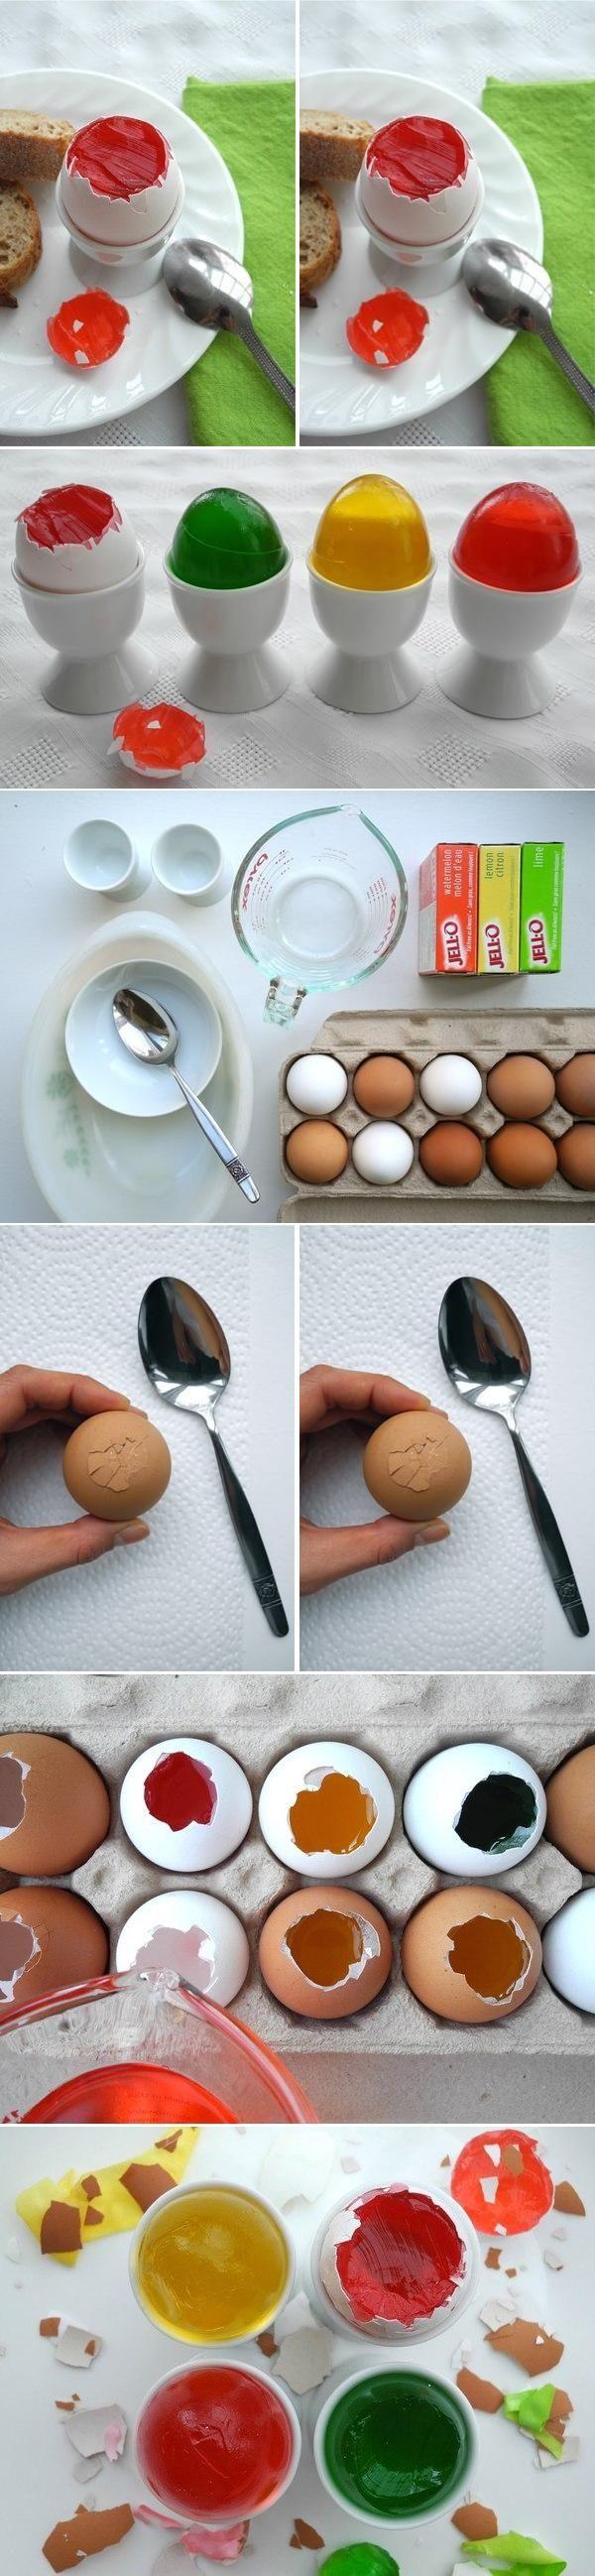 DIY Jello Gelatin Eggs DIY Projects | UsefulDIY.com Follow Us on Facebook ==> http://www.facebook.com/UsefulDiy